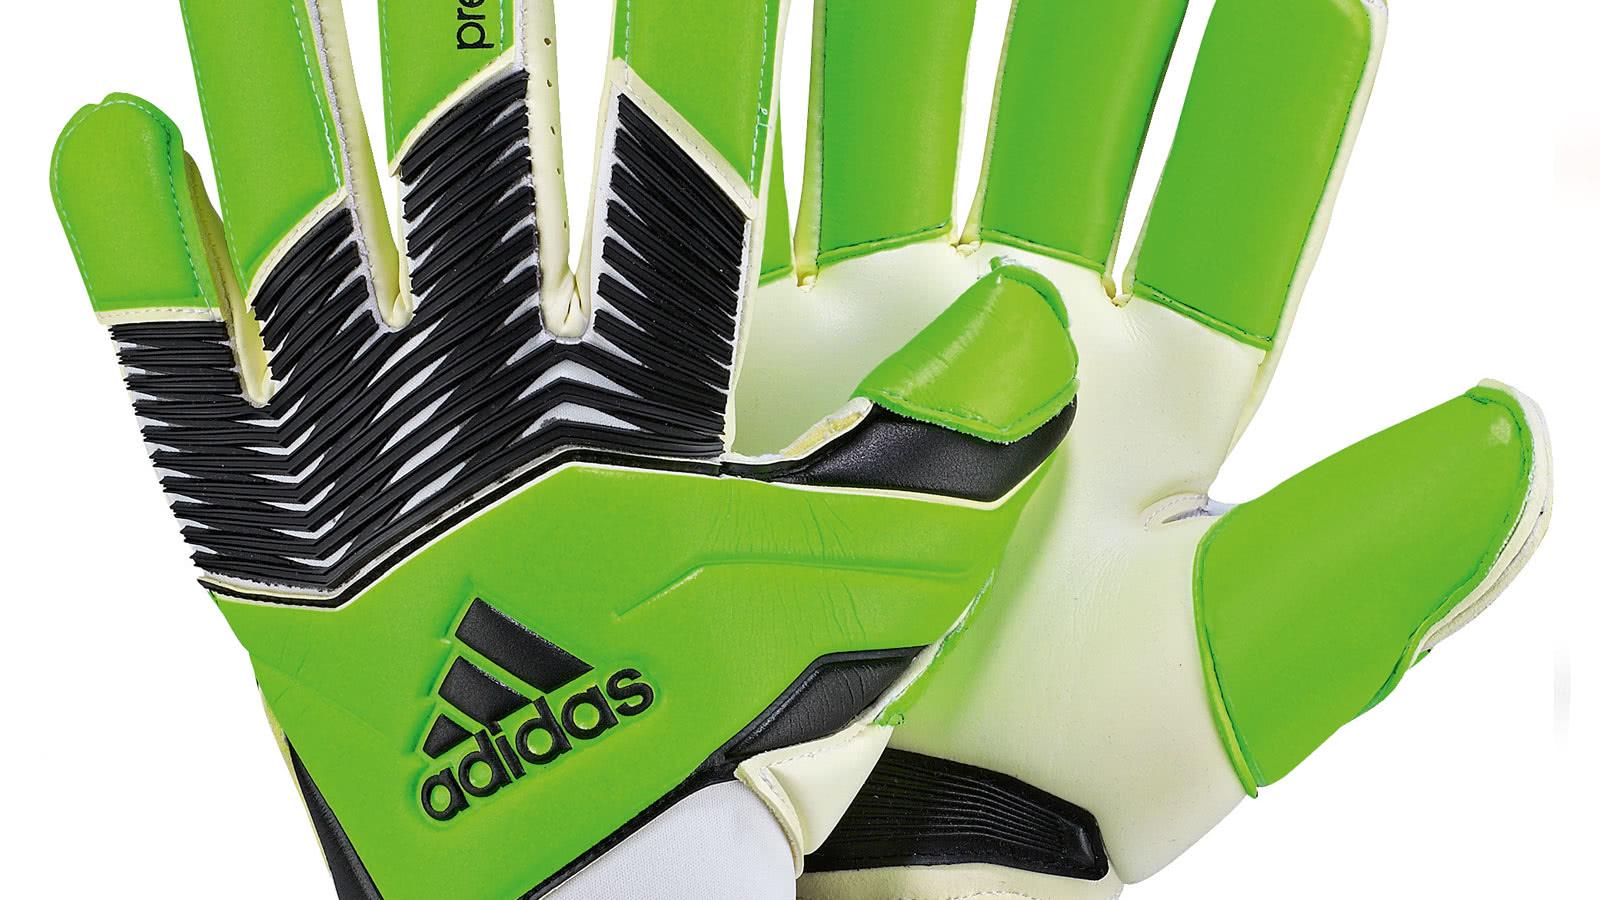 0174f9eb348832 Adidas Predator Zones Pro UCL solar green Edition - Sportartikel und ...